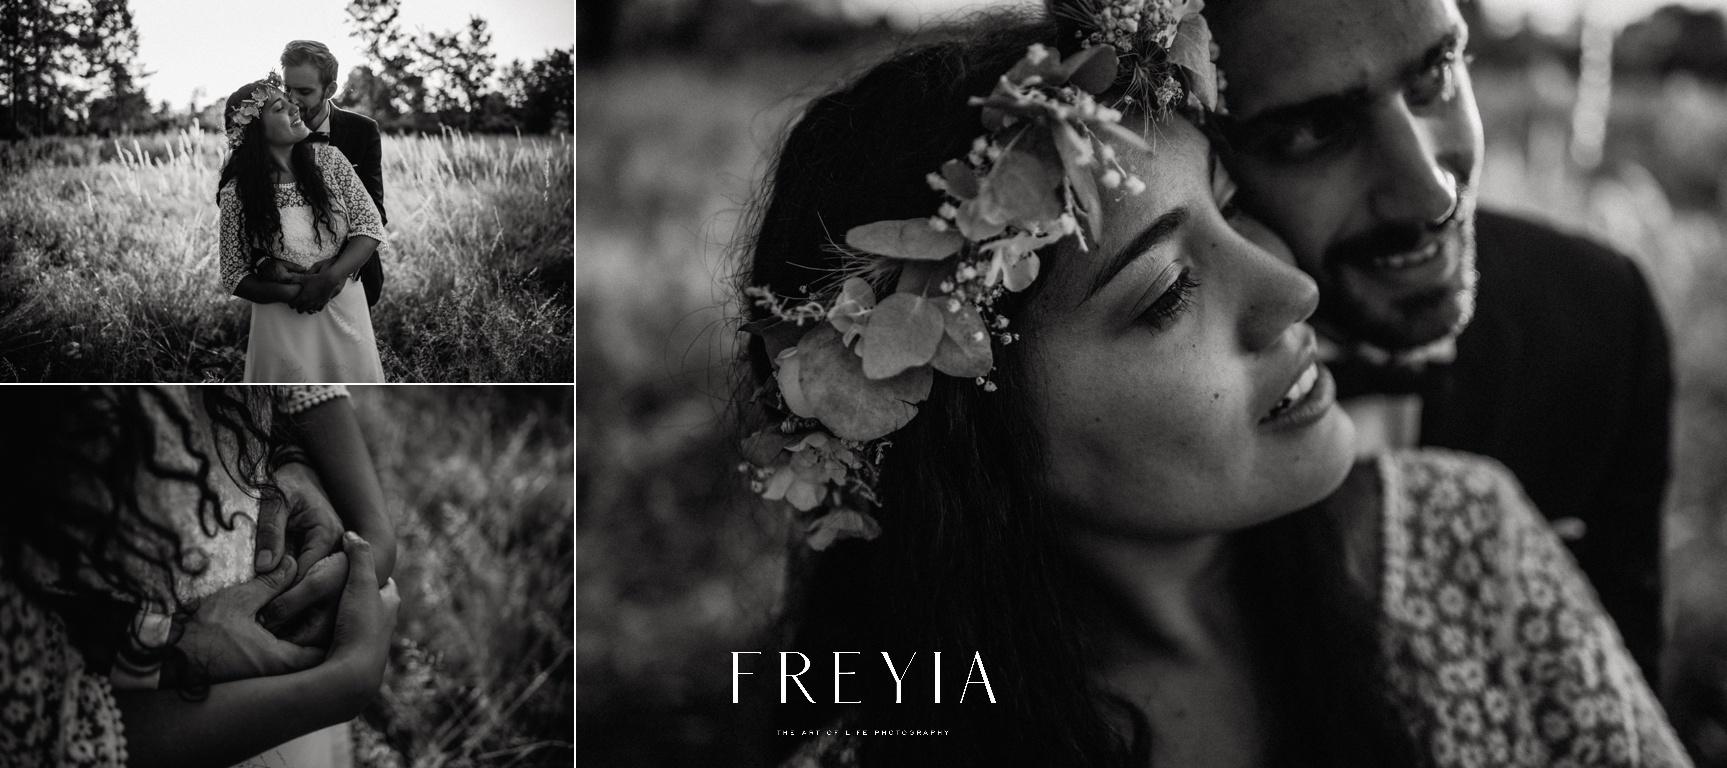 R + T |  mariage reportage alternatif moody intime minimaliste vintage naturel boho boheme |  PHOTOGRAPHE mariage PARIS france destination  | FREYIA photography_-289.jpg